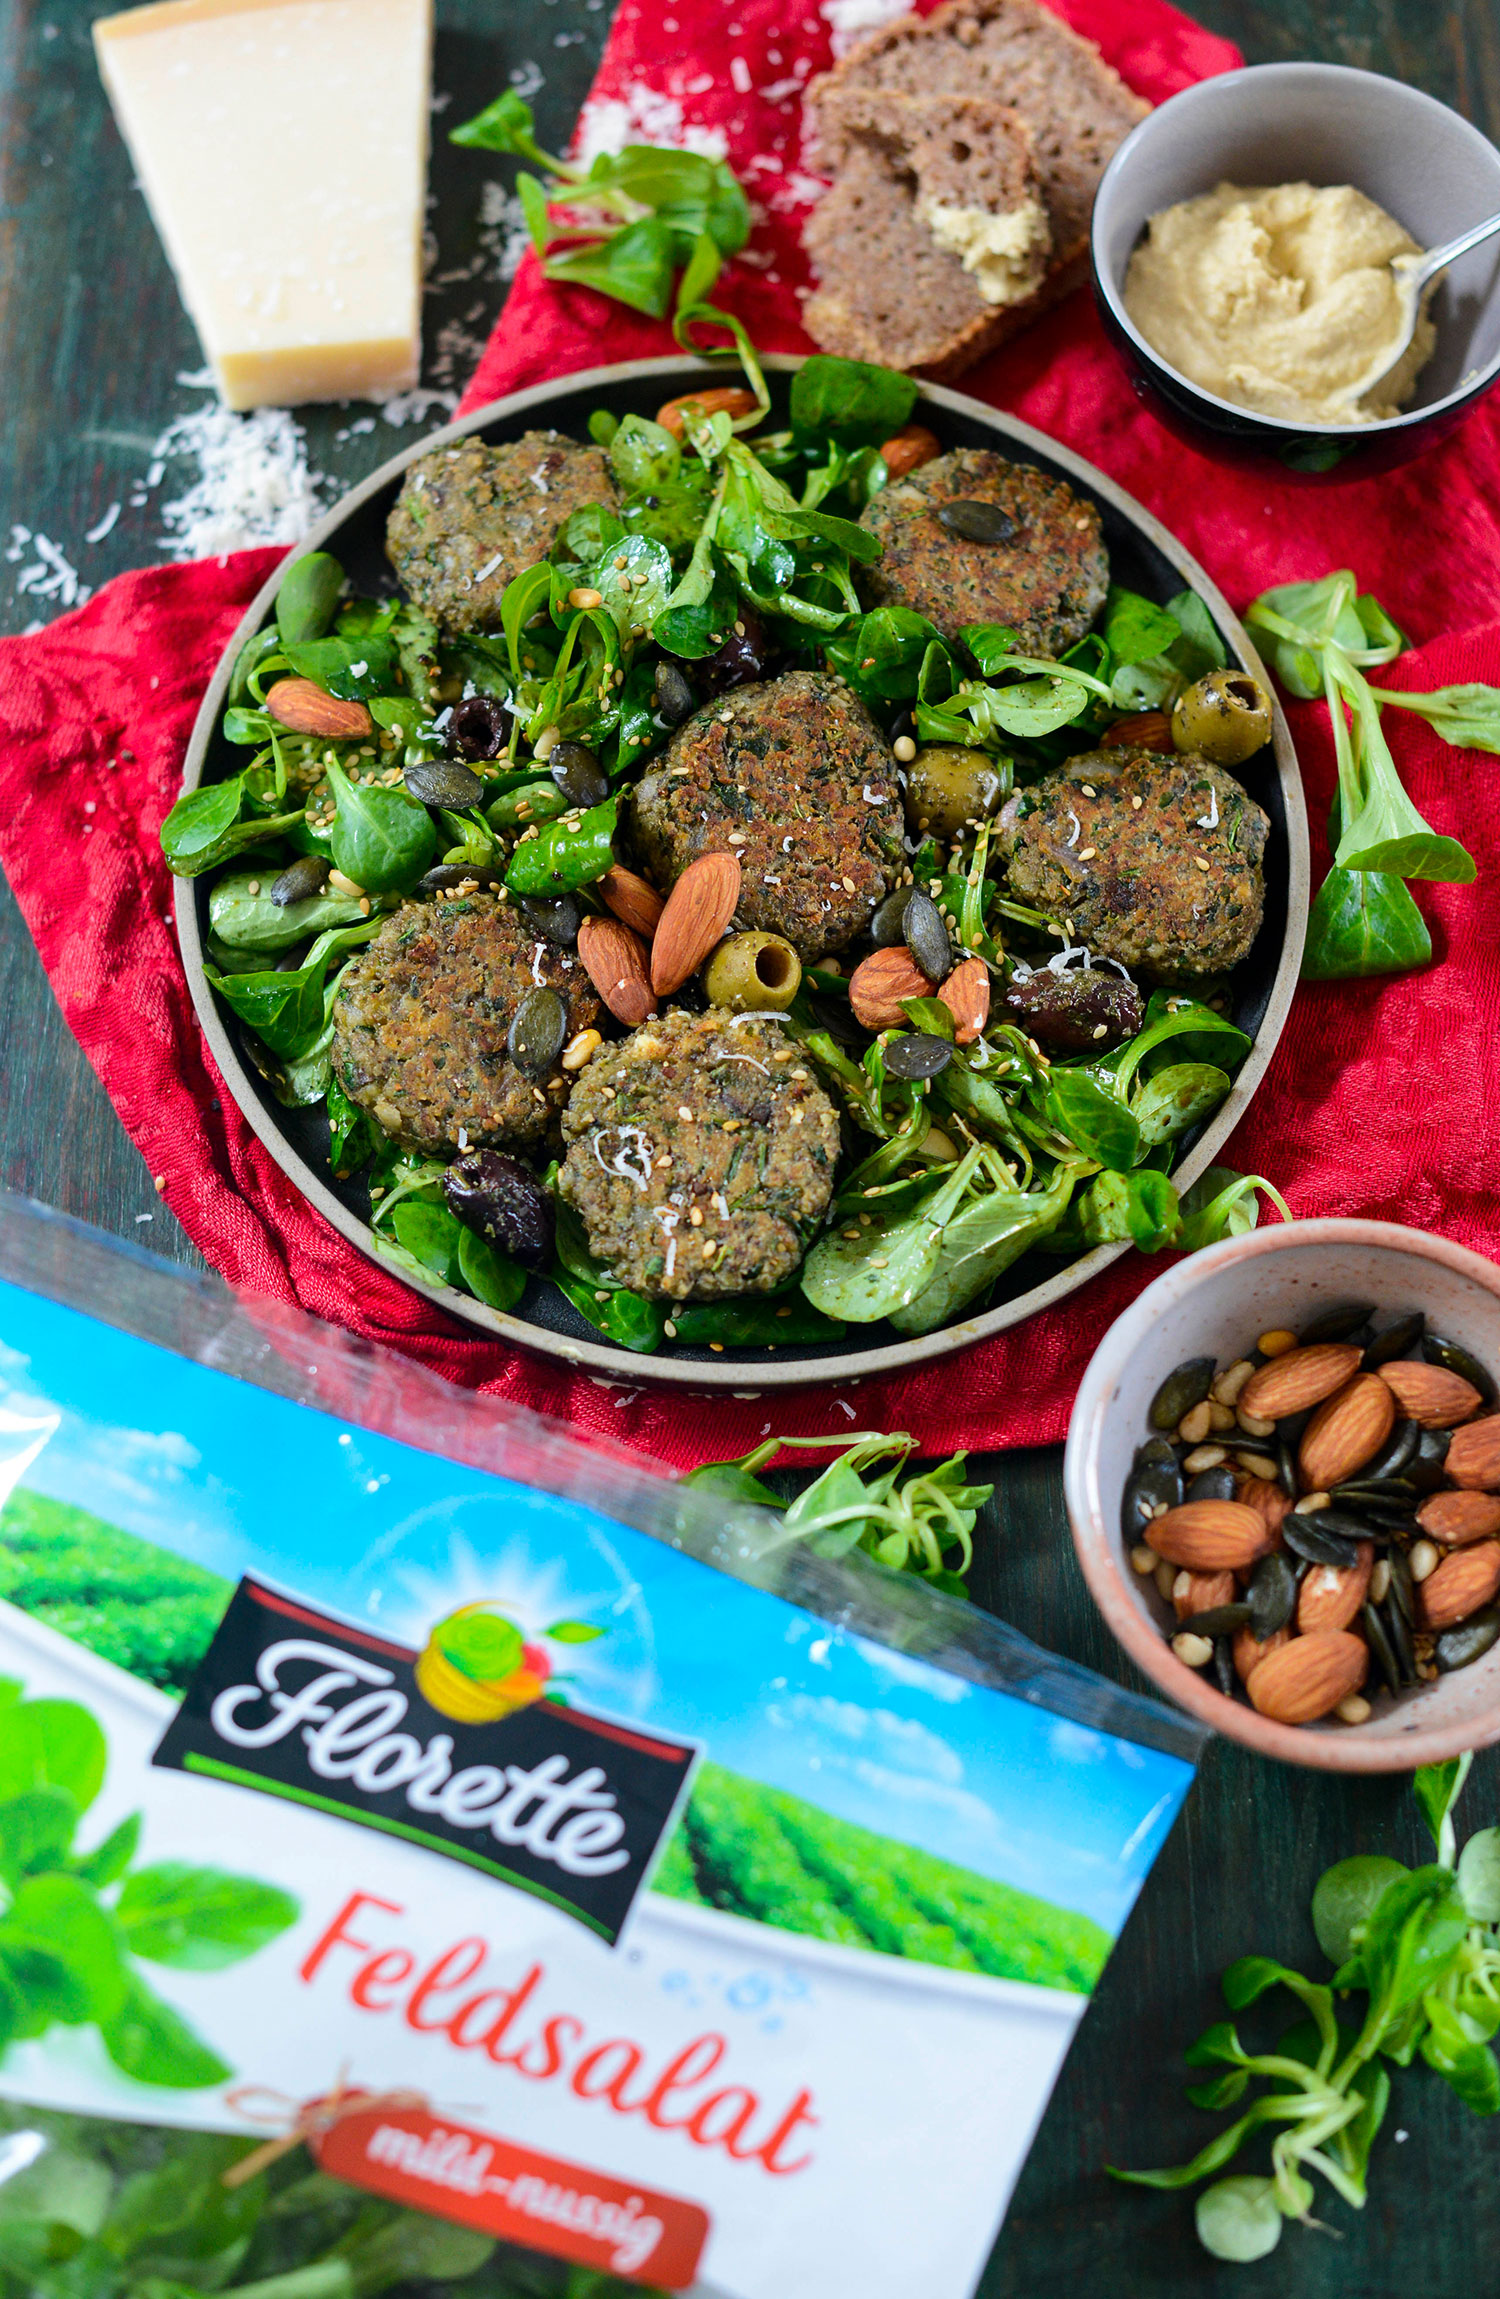 Florette_lambs-lettuce-mushroom-fritters-1